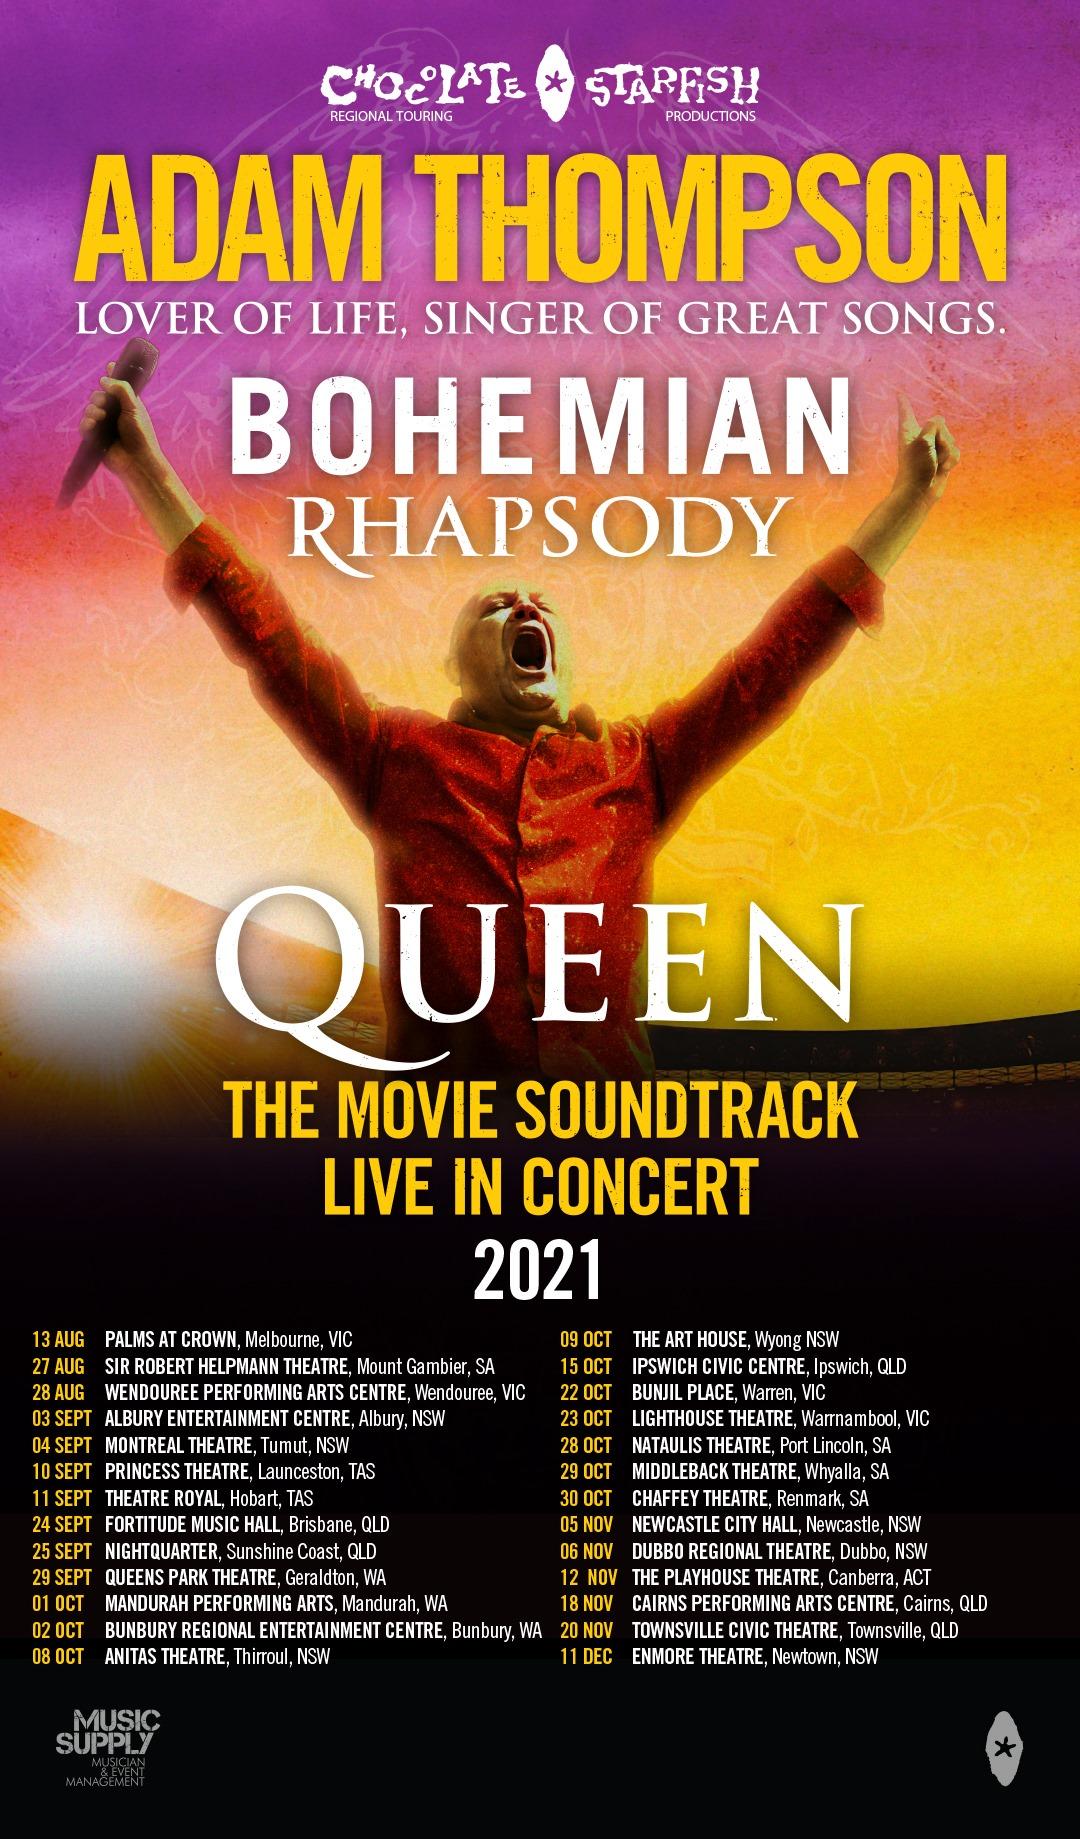 Adam Thompson  performs Bohemian Rhapsody